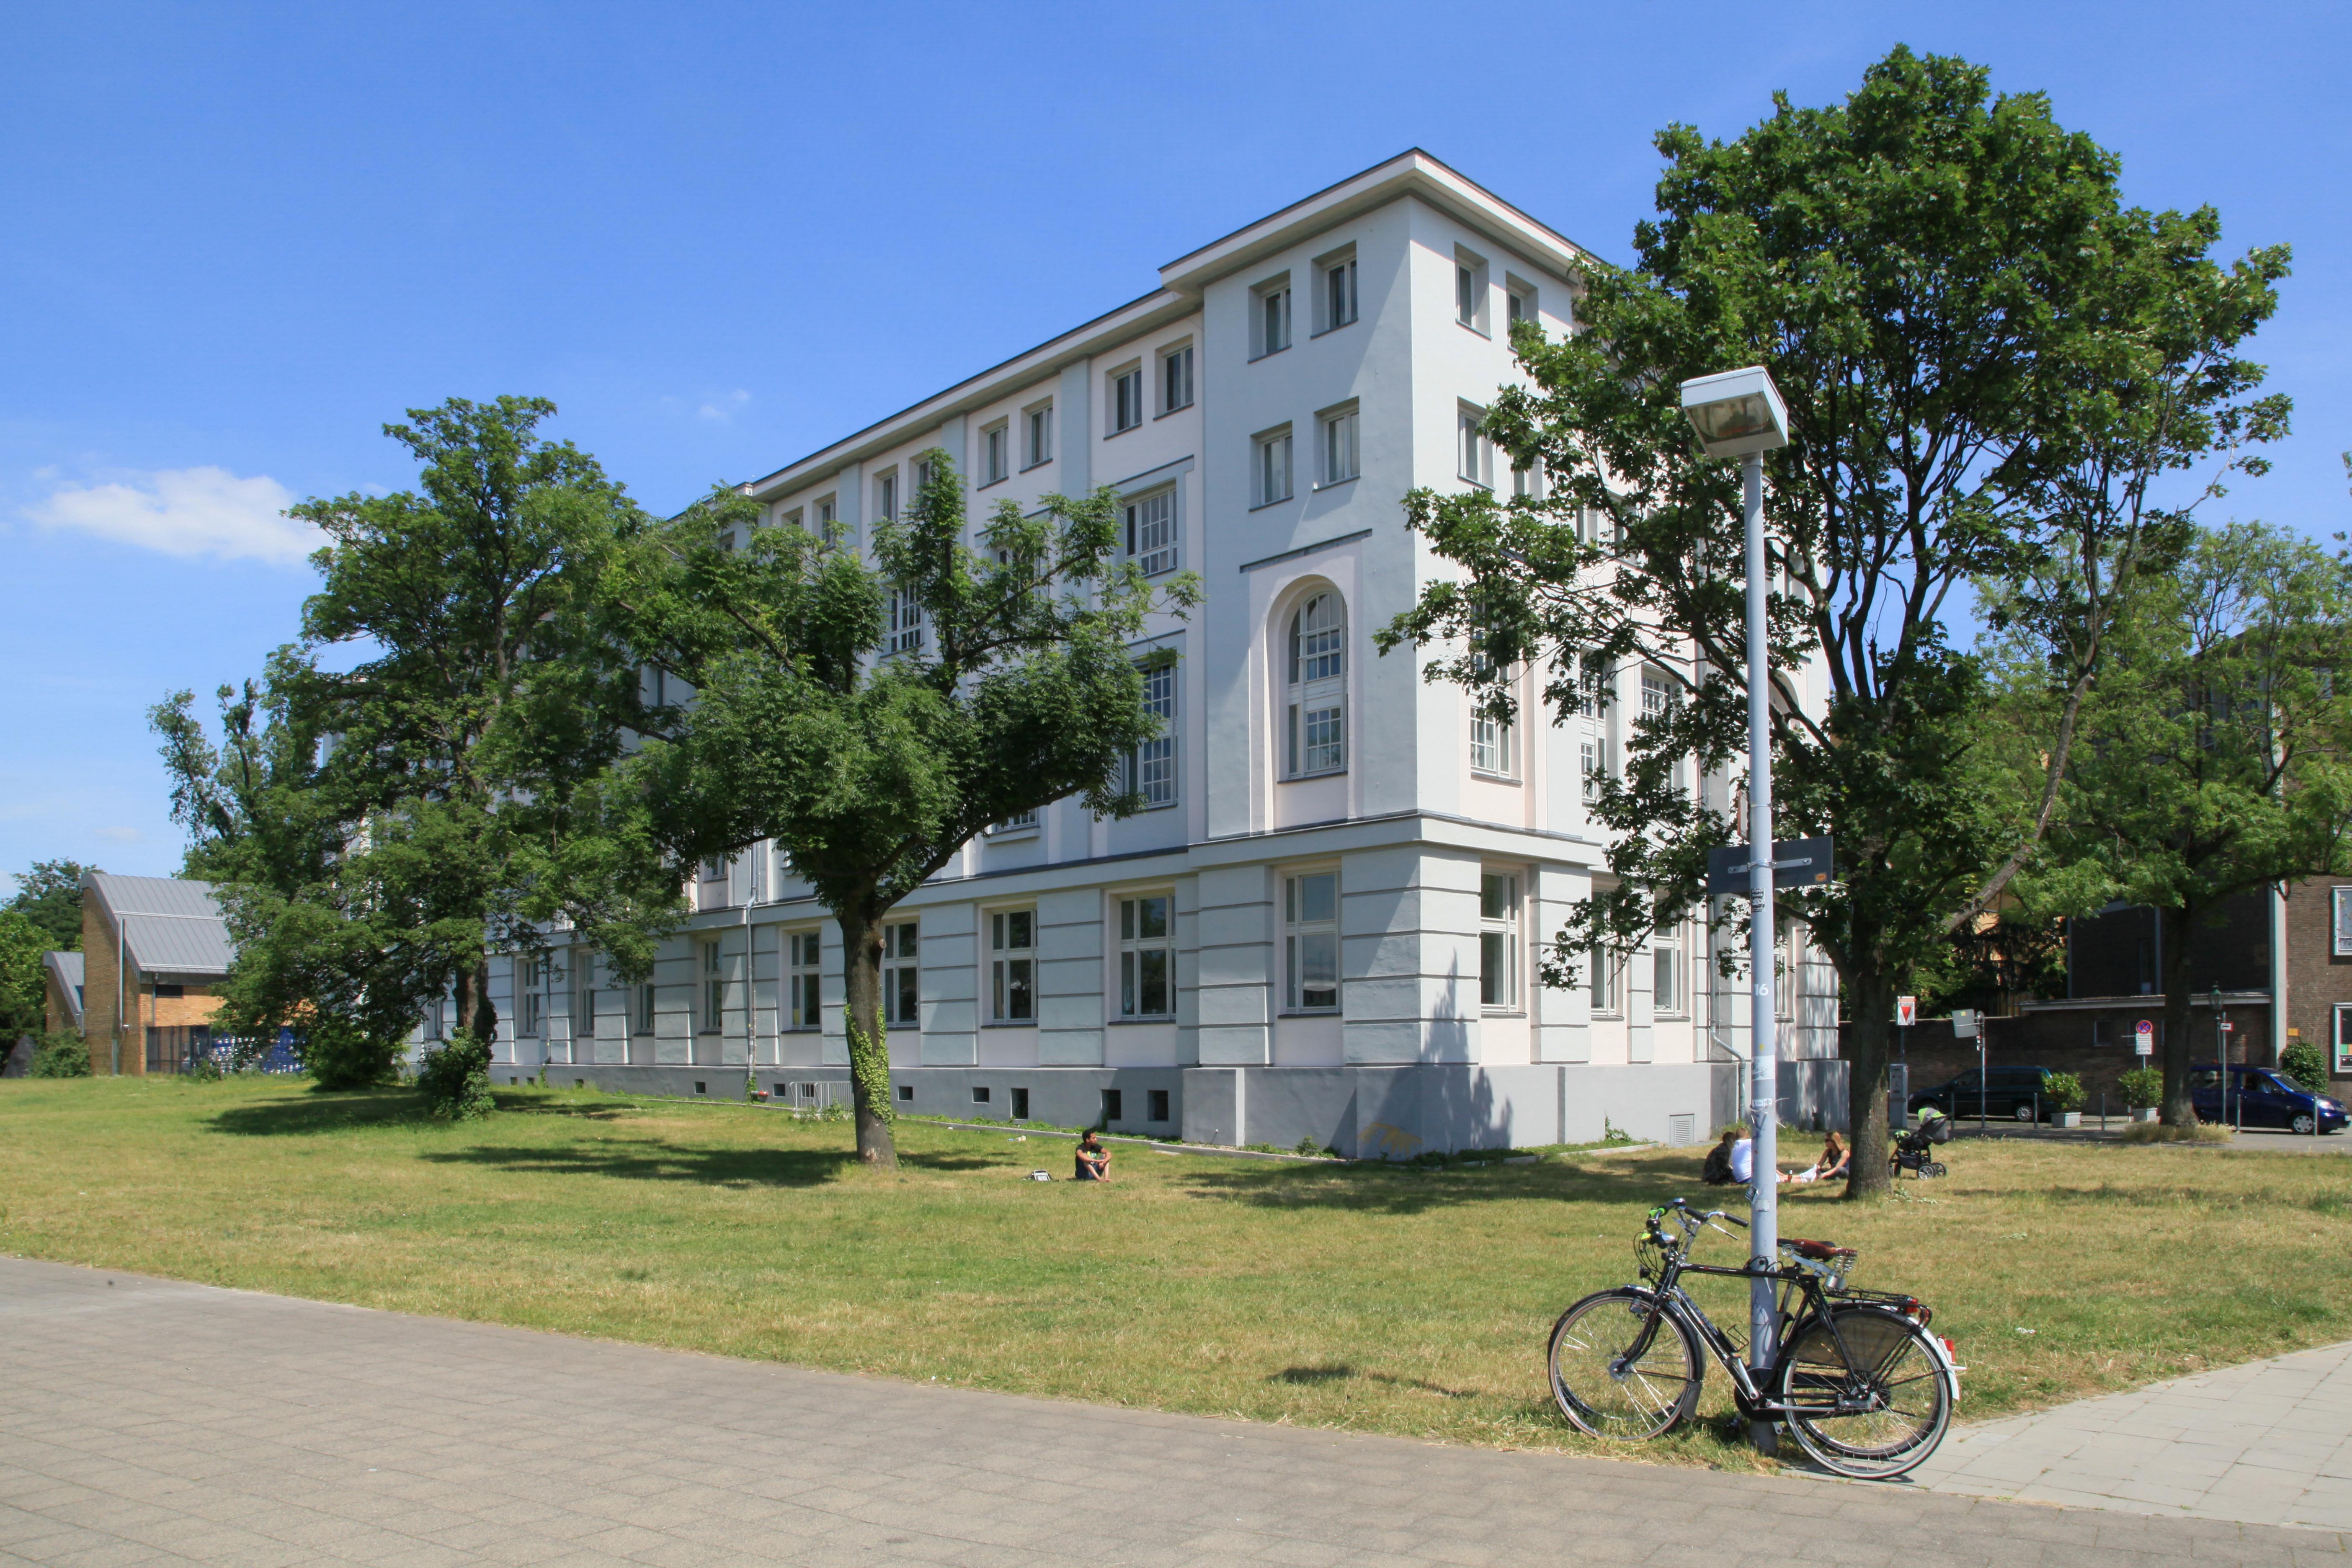 File:Düsseldorf - Schlossufer + Reuterkaserne - 1Archiv 01